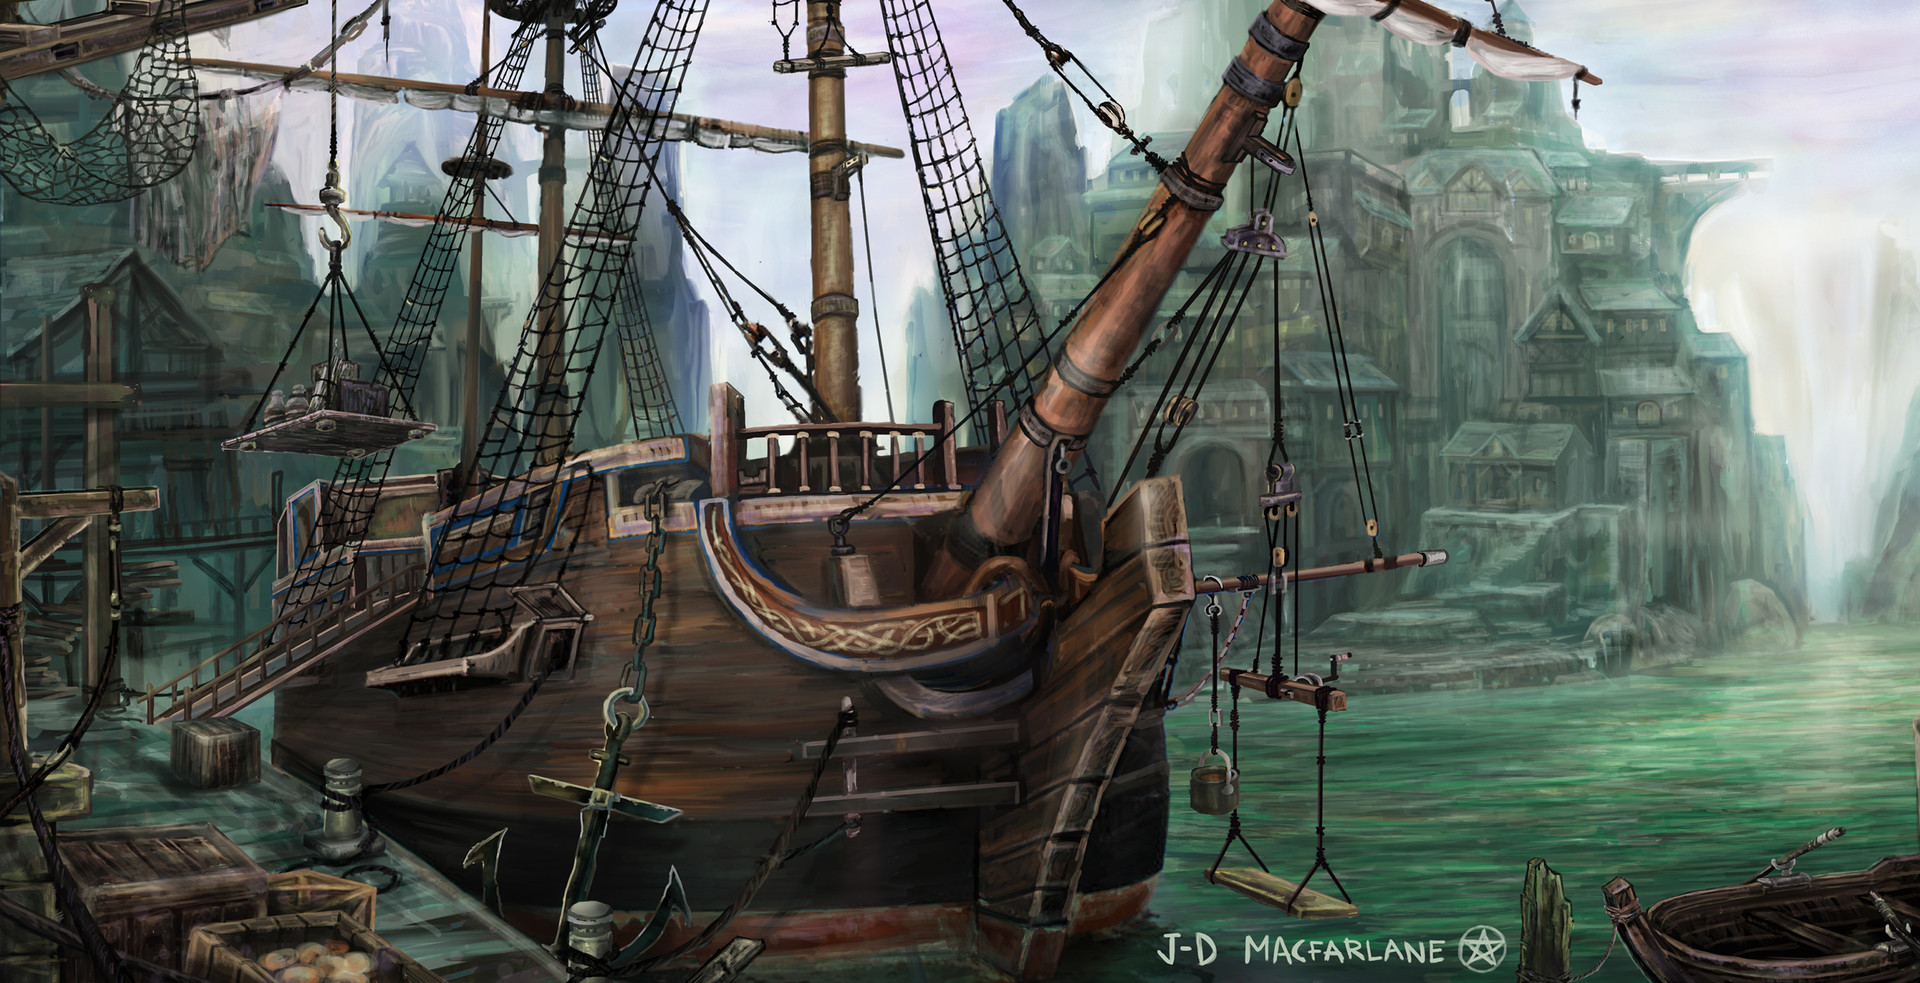 j-d-macfarlane-dock-master-finale-01-for